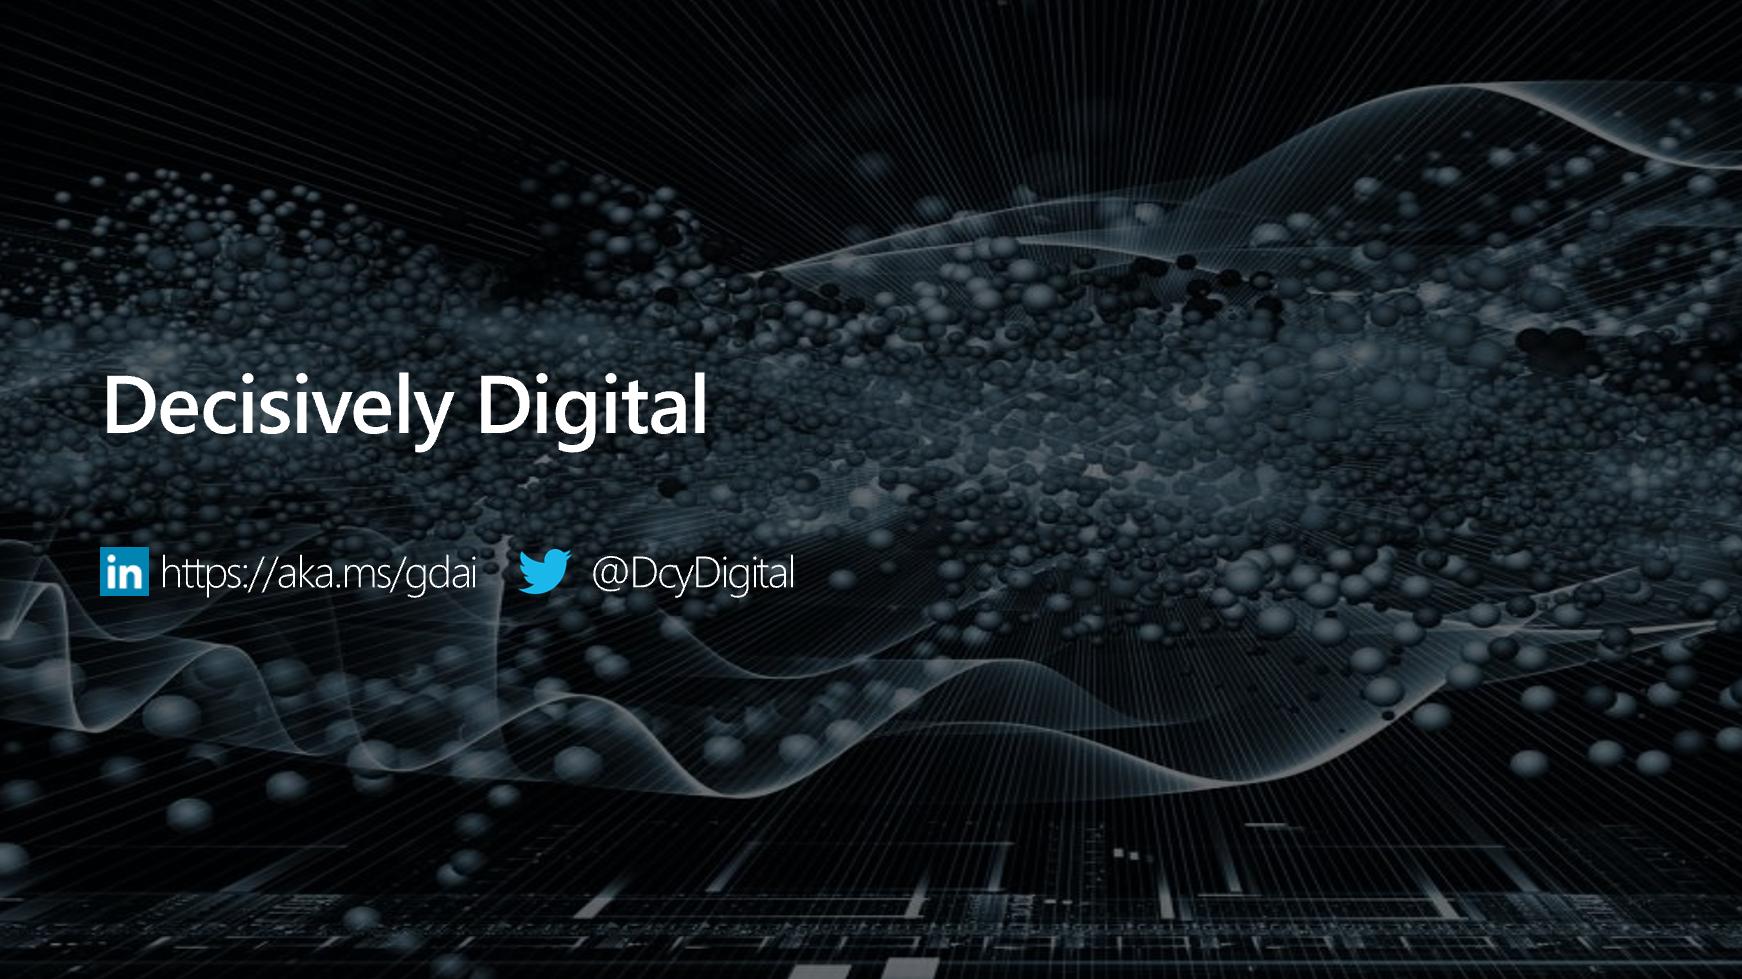 Decisively Digital